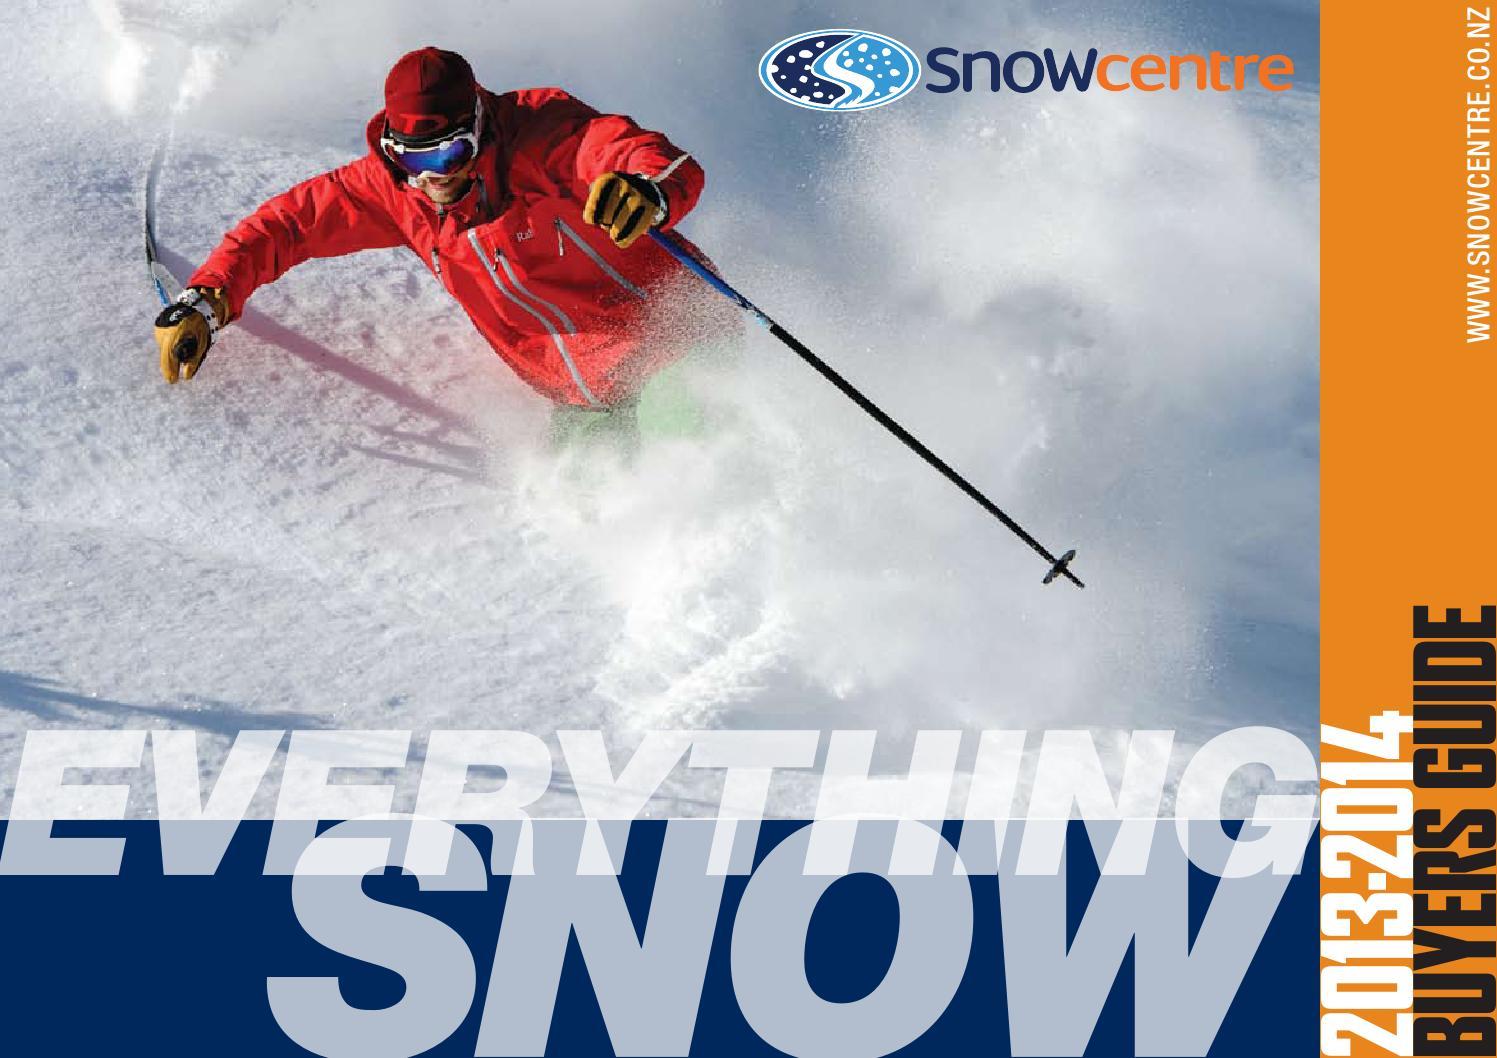 Snowcentre 2013 14 Buyers Guide by Jordan Gosling - issuu cc810228e